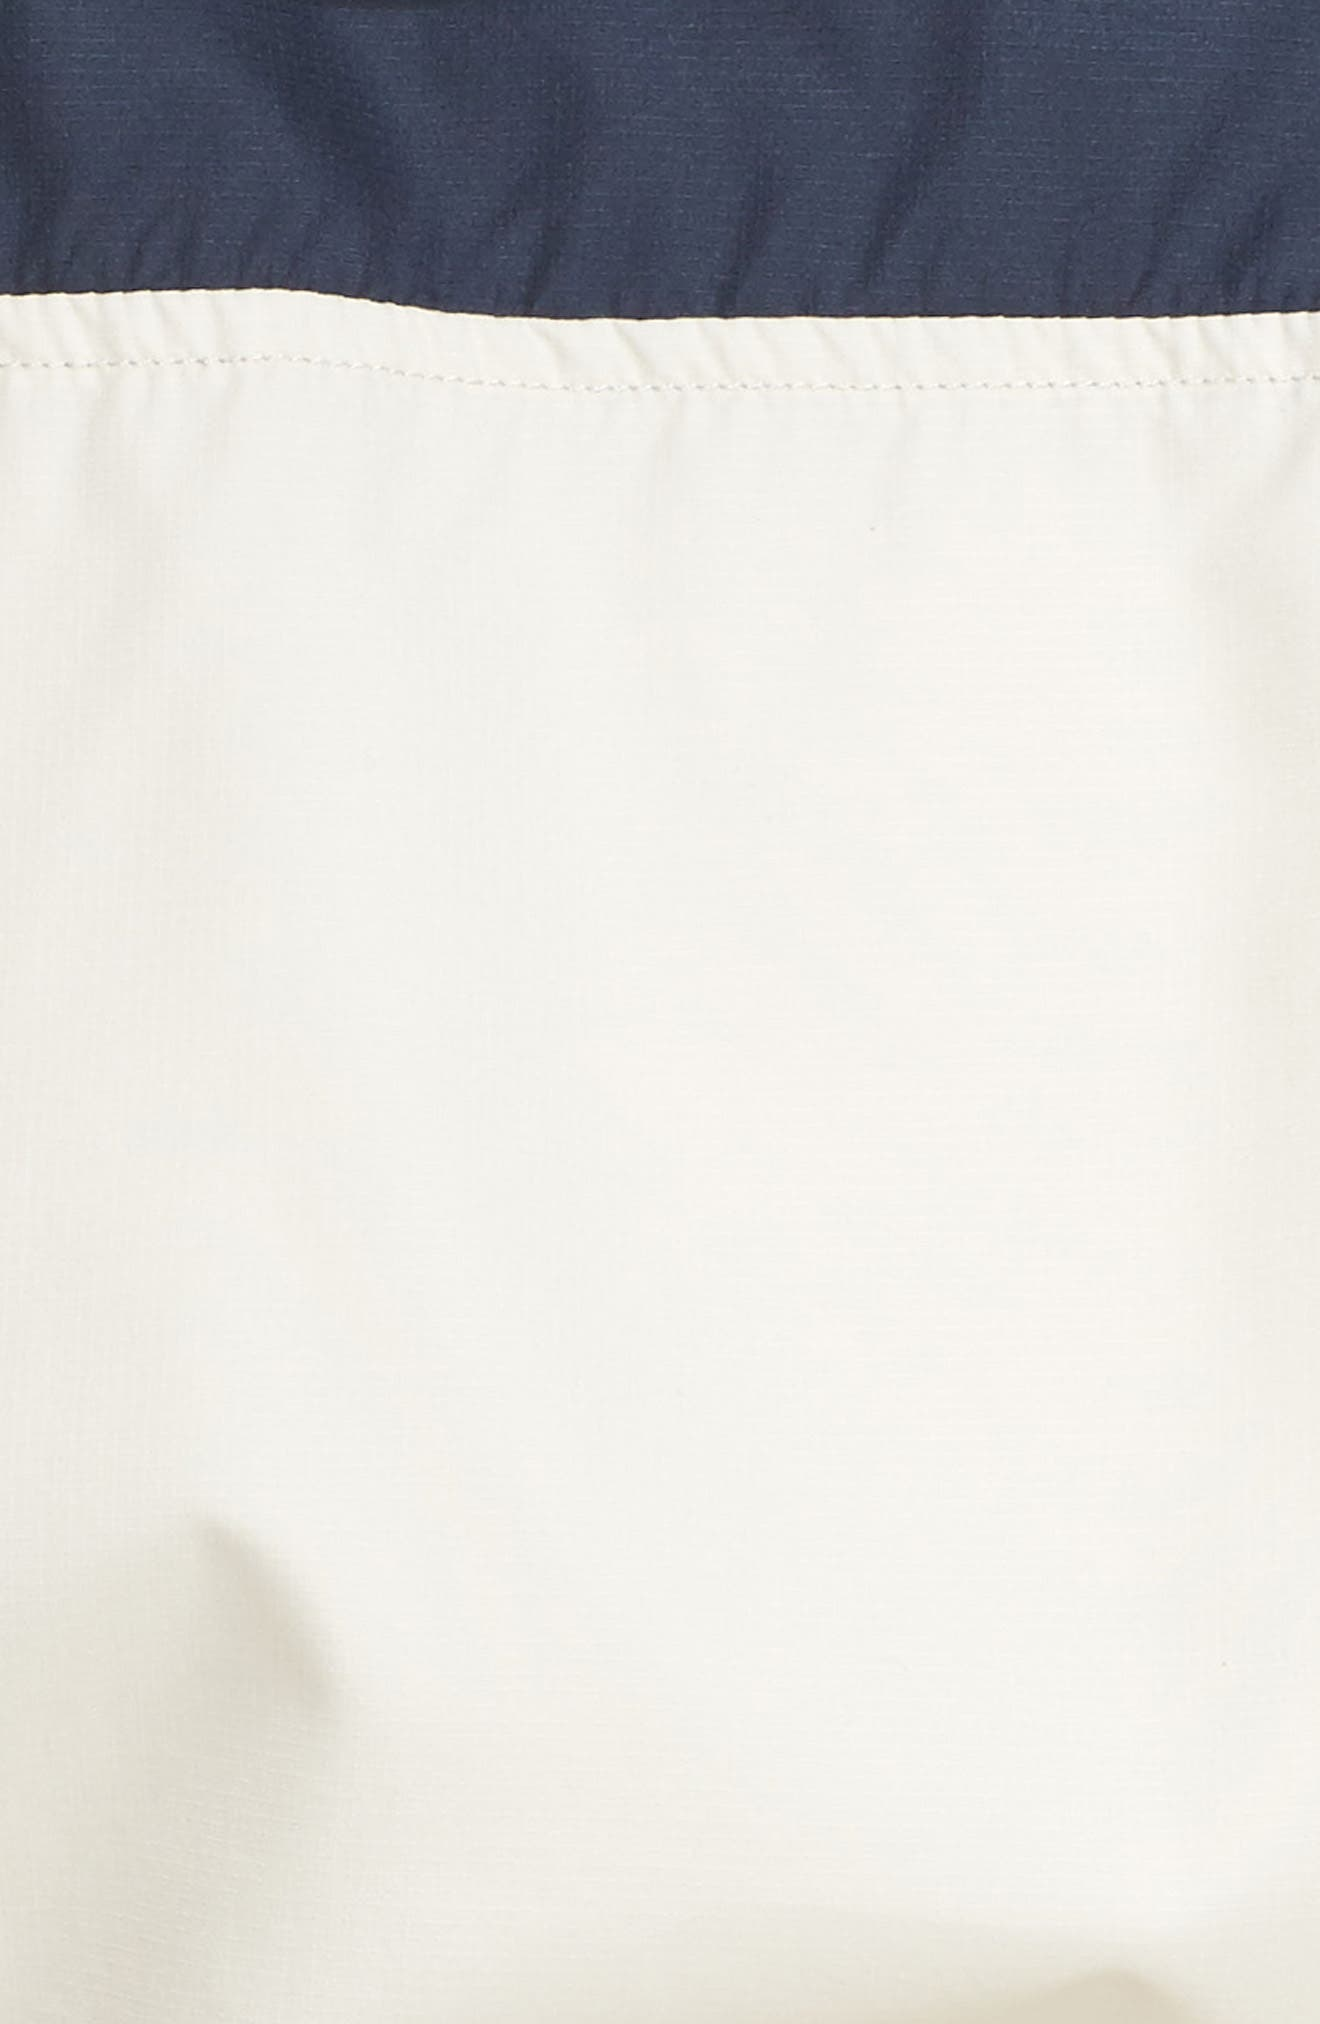 Fanorak Jacket,                             Alternate thumbnail 8, color,                             100